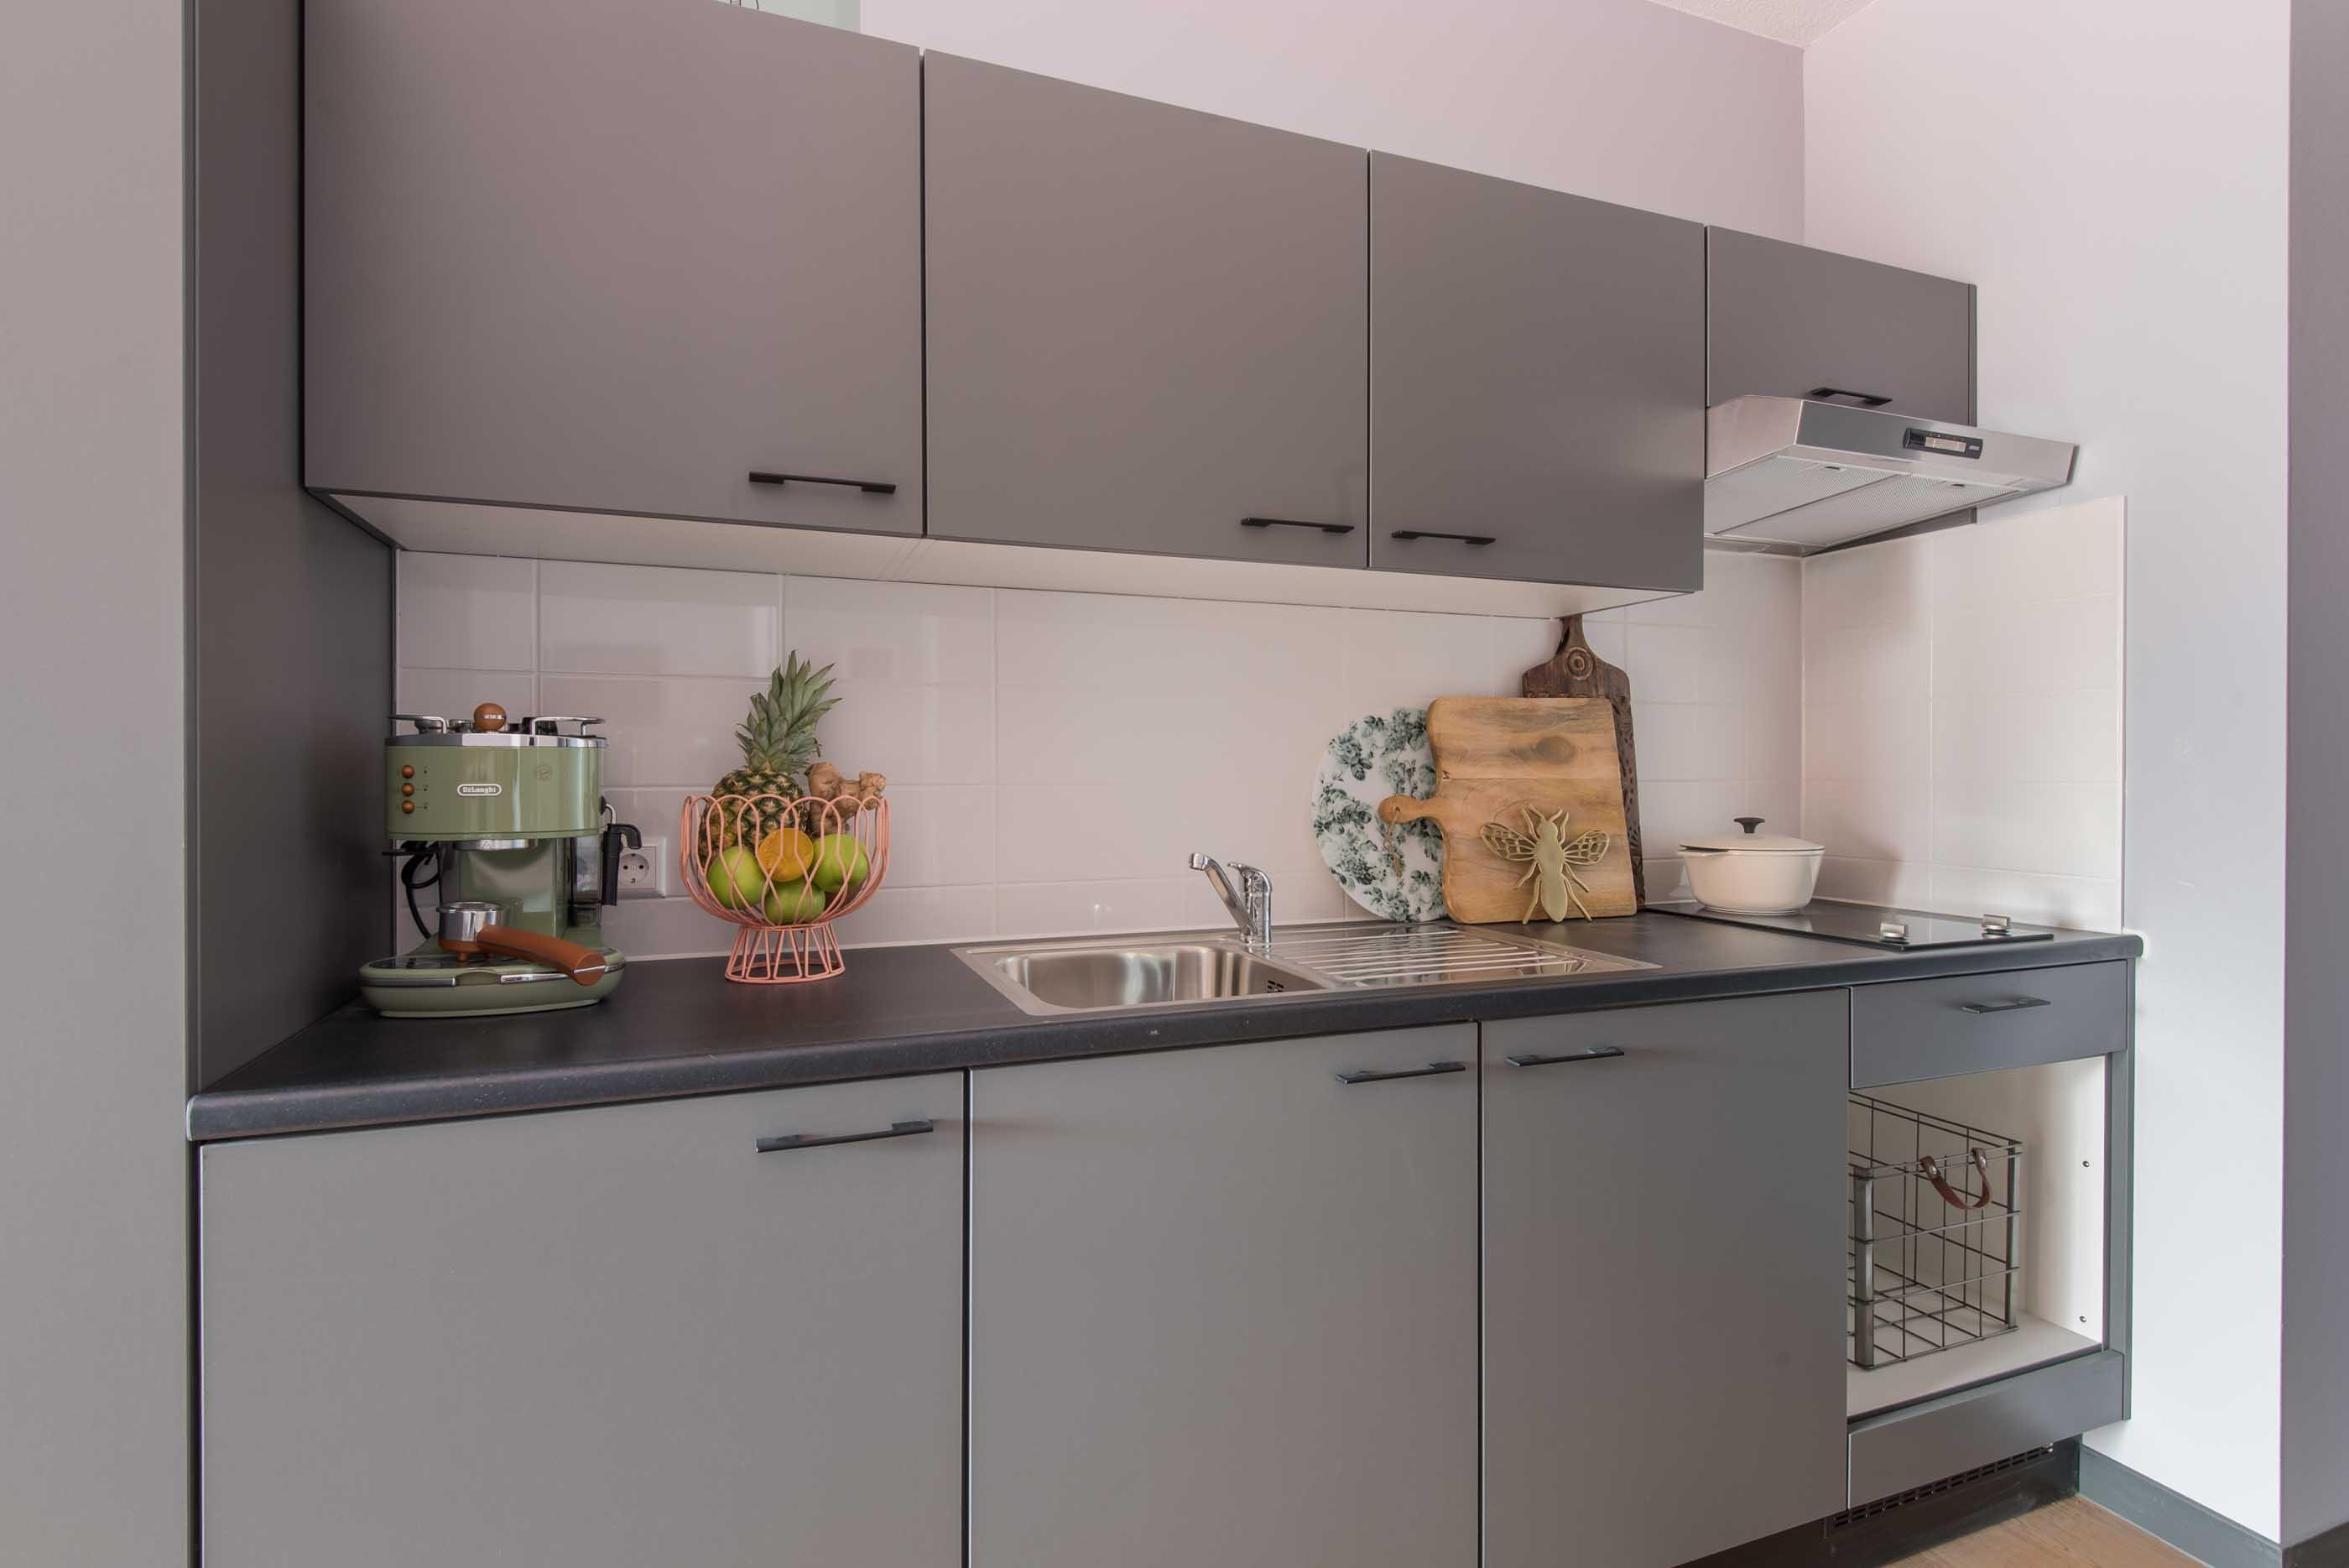 Executive Studio in OurDomain Amsterdam Diemen - interior design of the living room